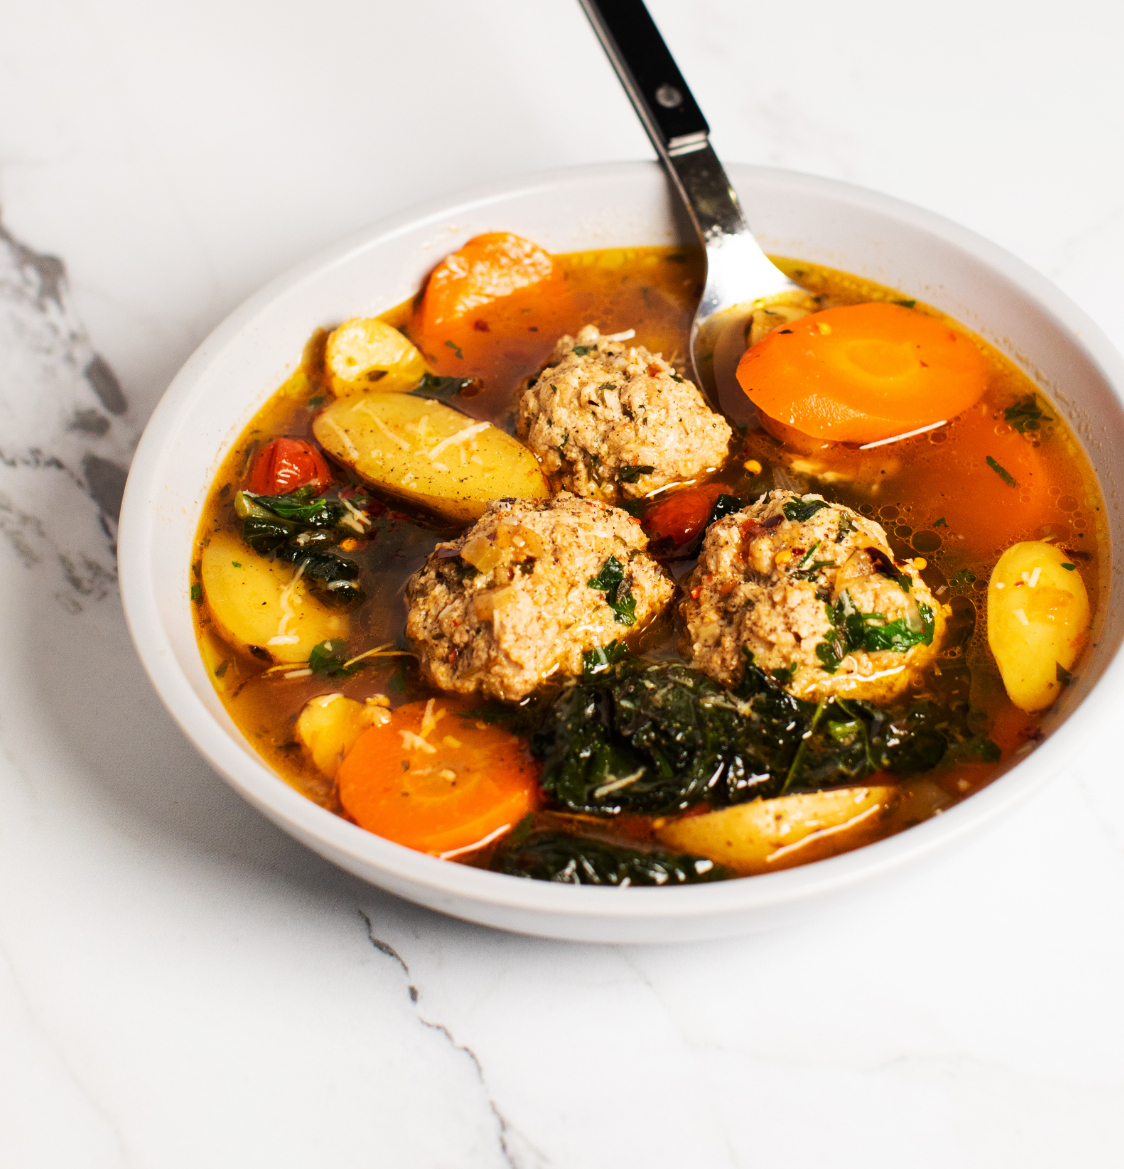 Ricotta and Pork Meatball Soup